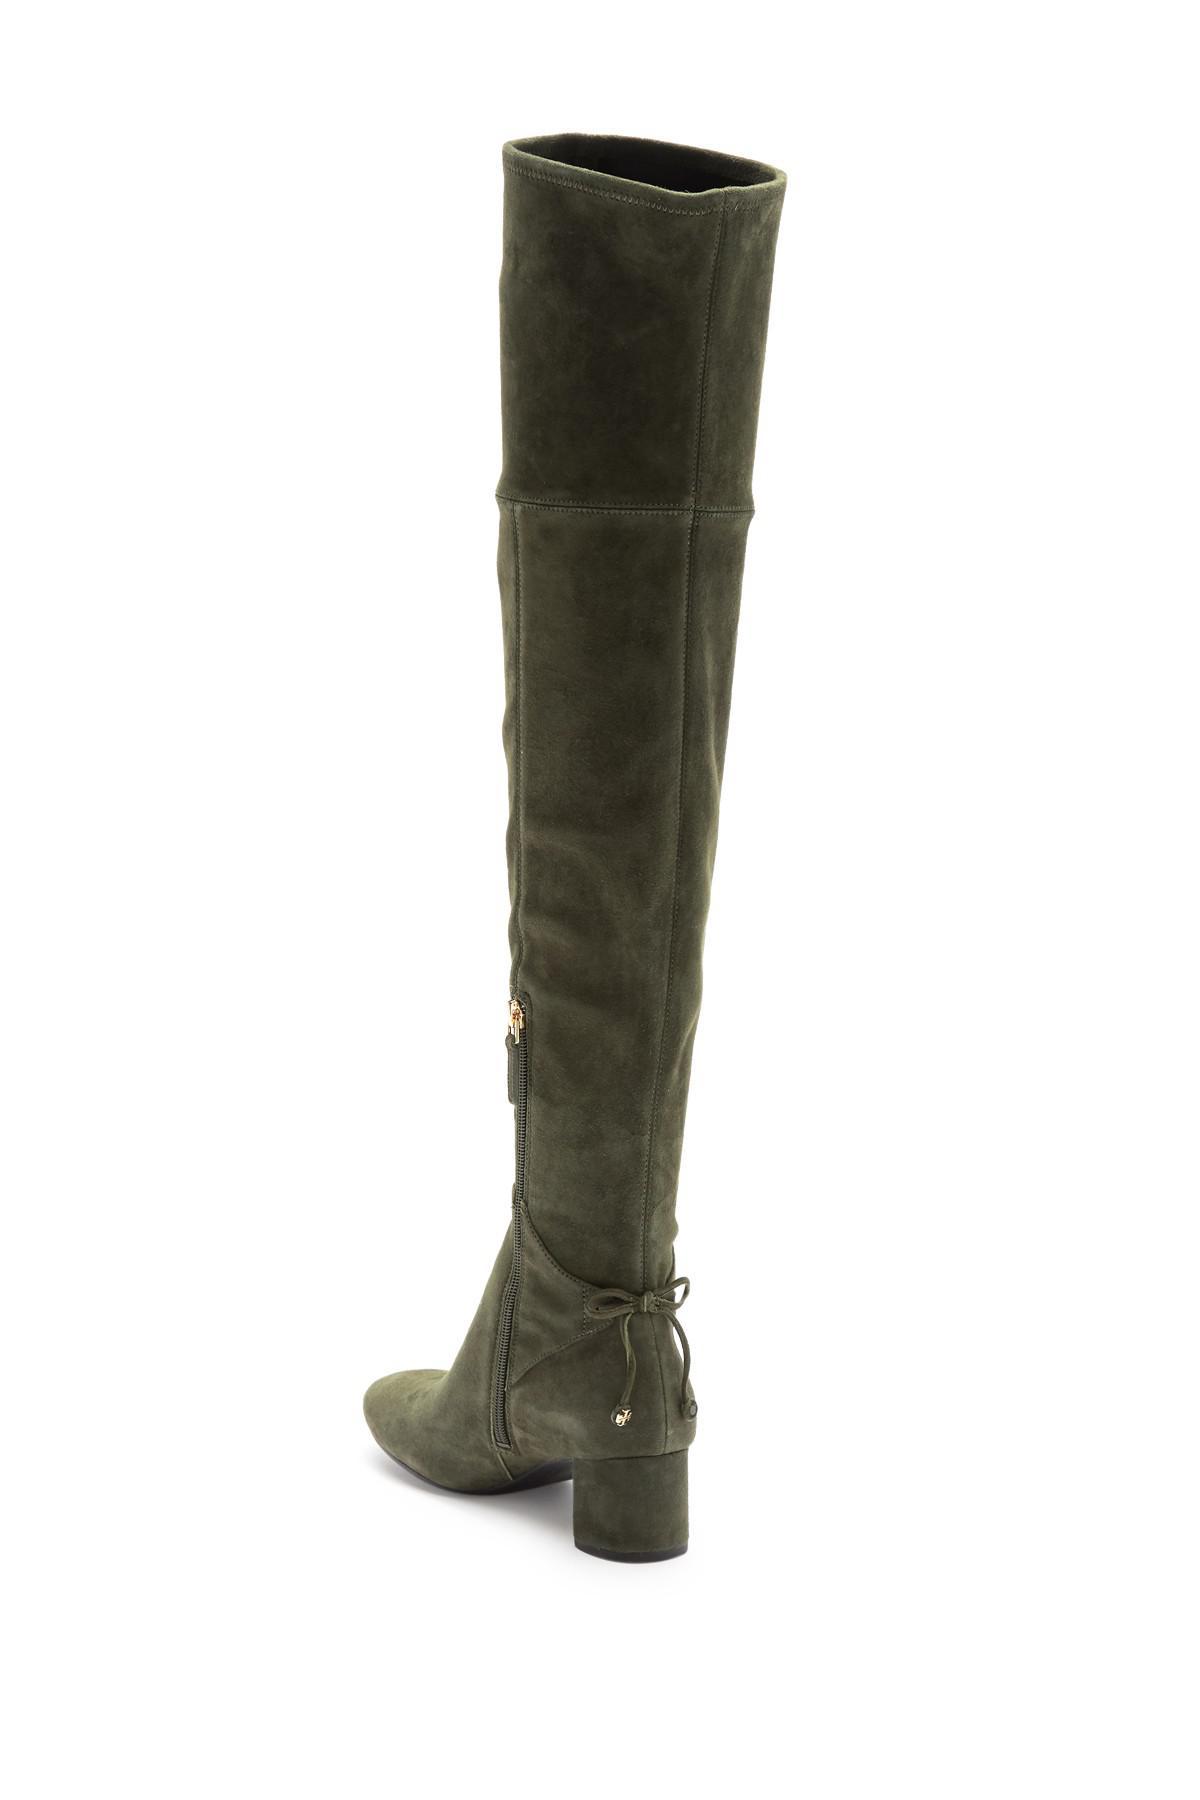 e2dde3fa59dec3 Tory Burch - Multicolor Laila Over The Knee Boot - Lyst. View fullscreen